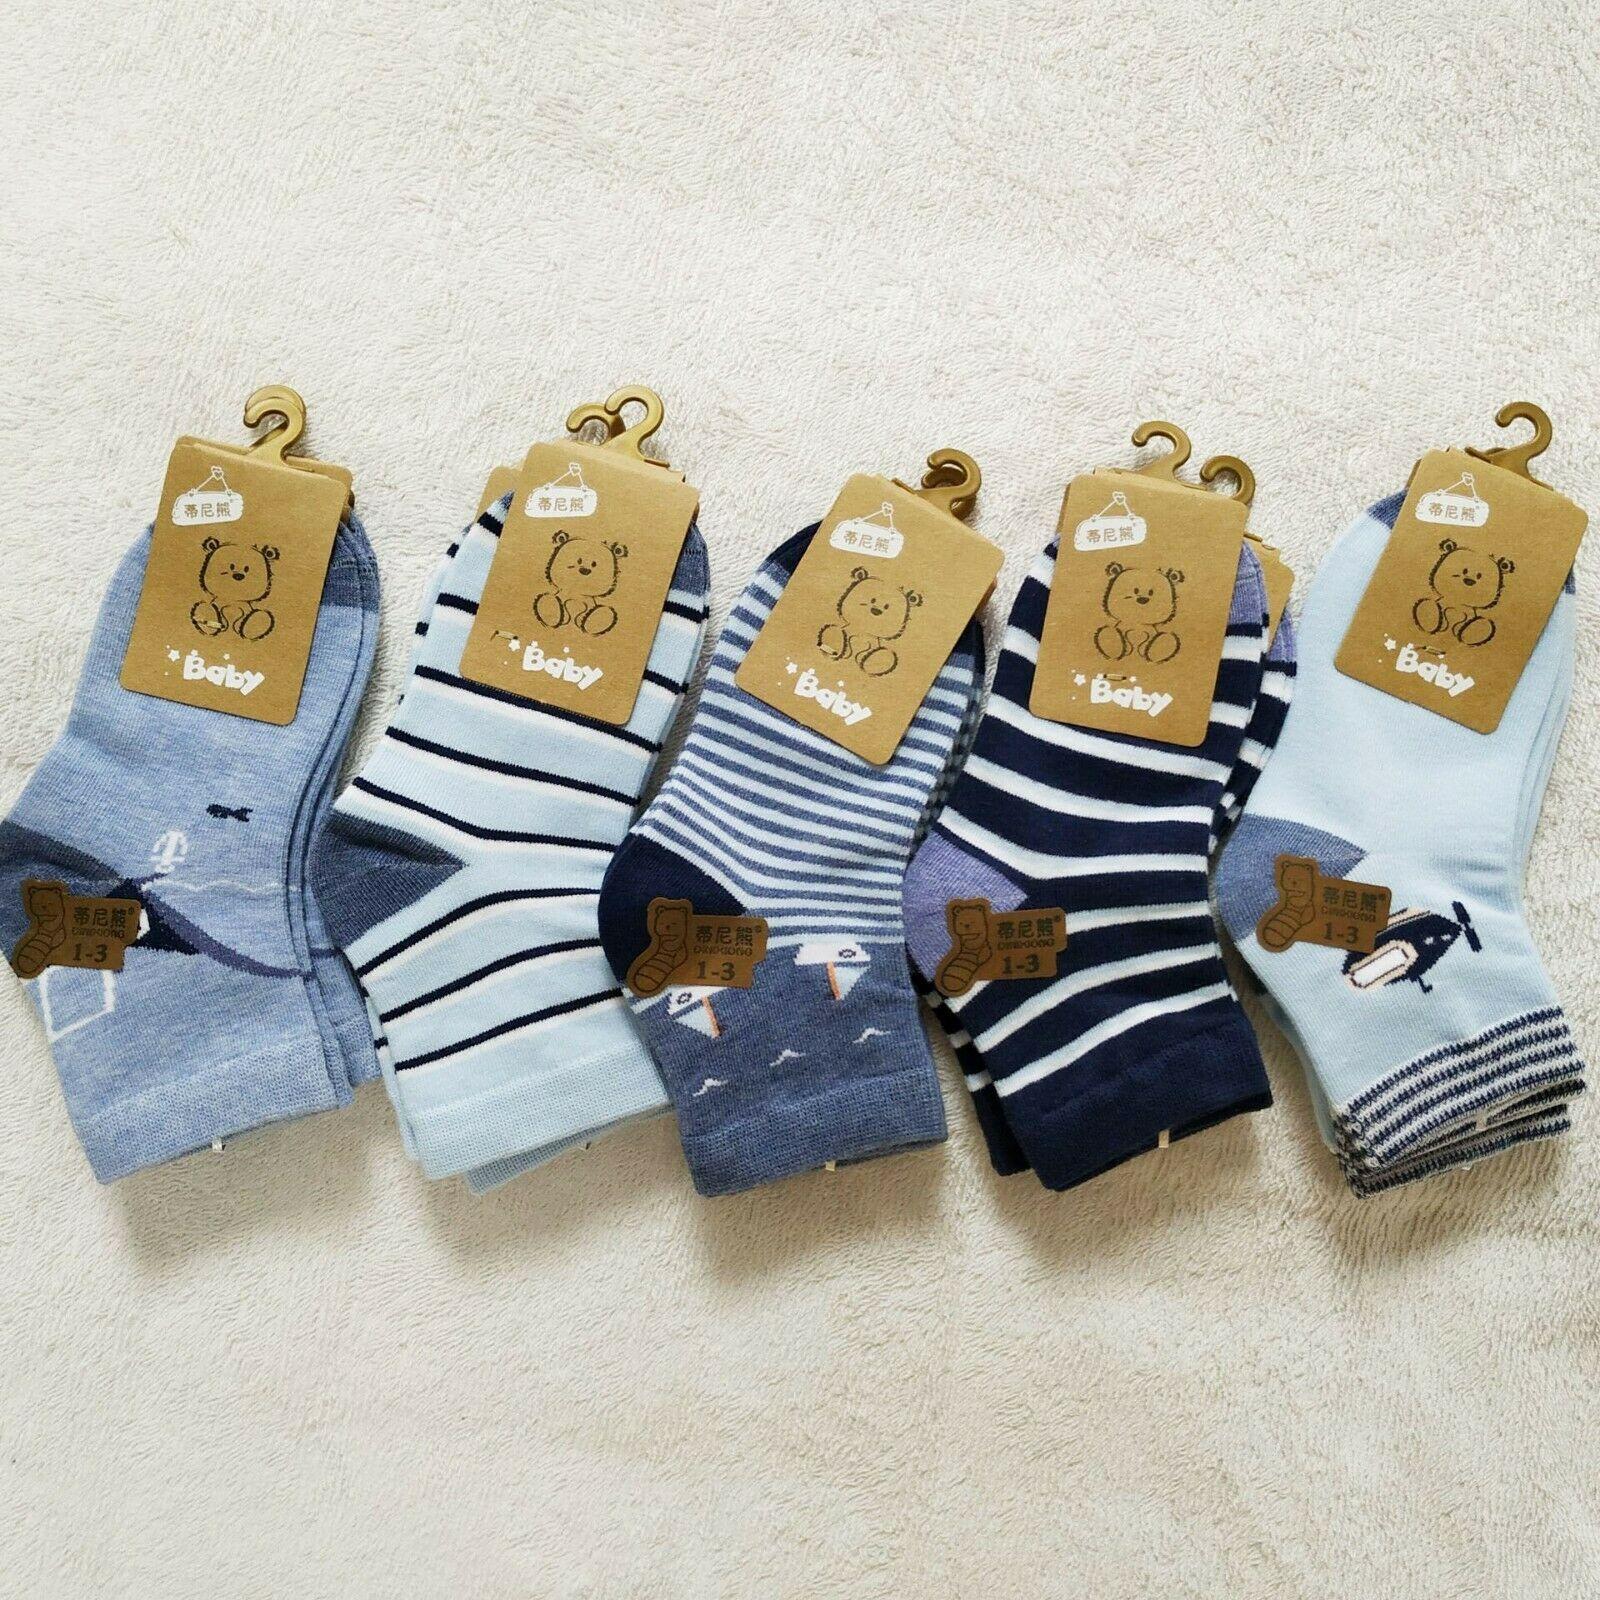 5 Pairs/Lot Cotton Children Socks Boy Socks Girl Socks Cute Cartoon Stripes Spring Autumn Summer